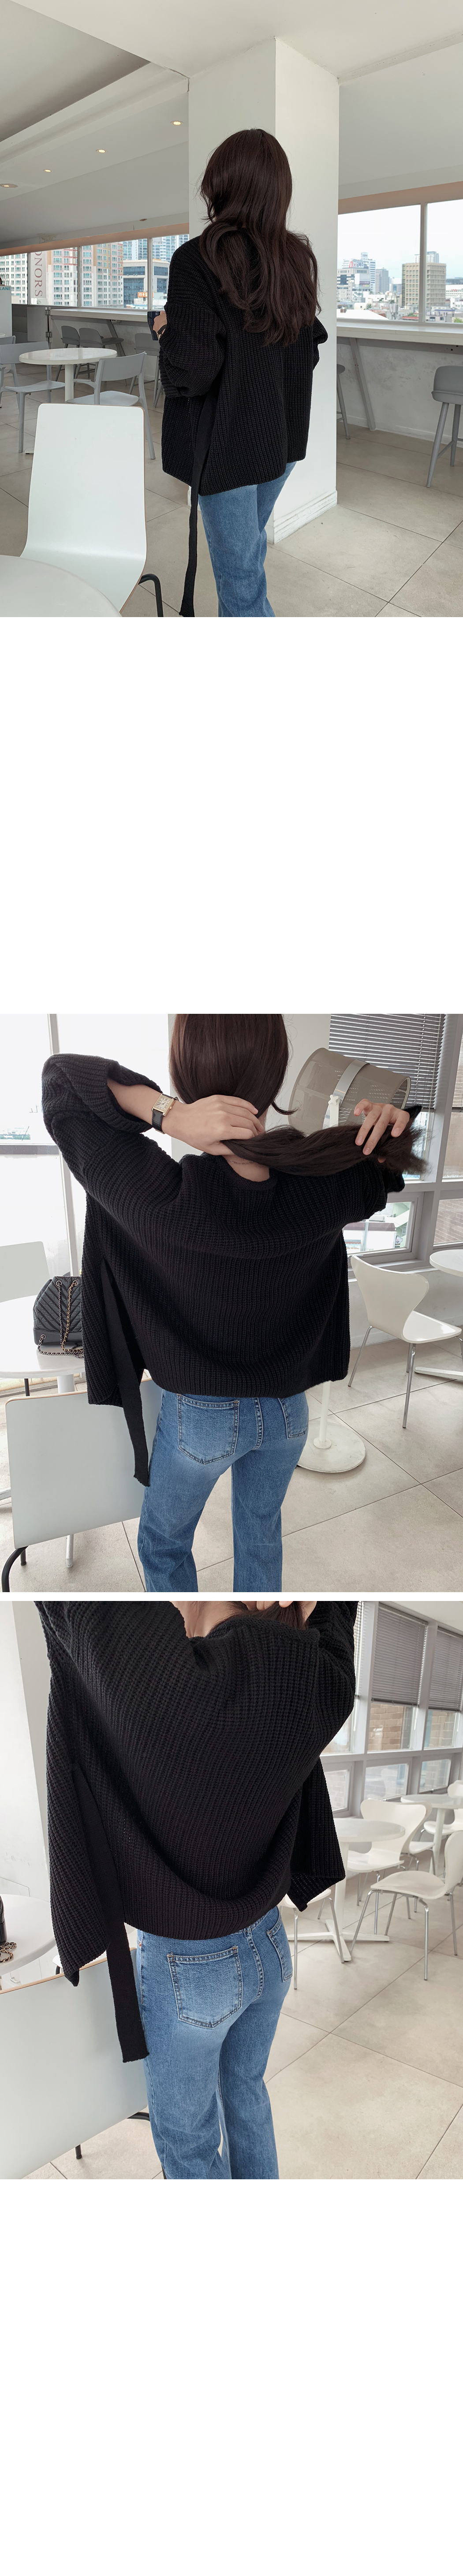 Strap belt wrap cardigan